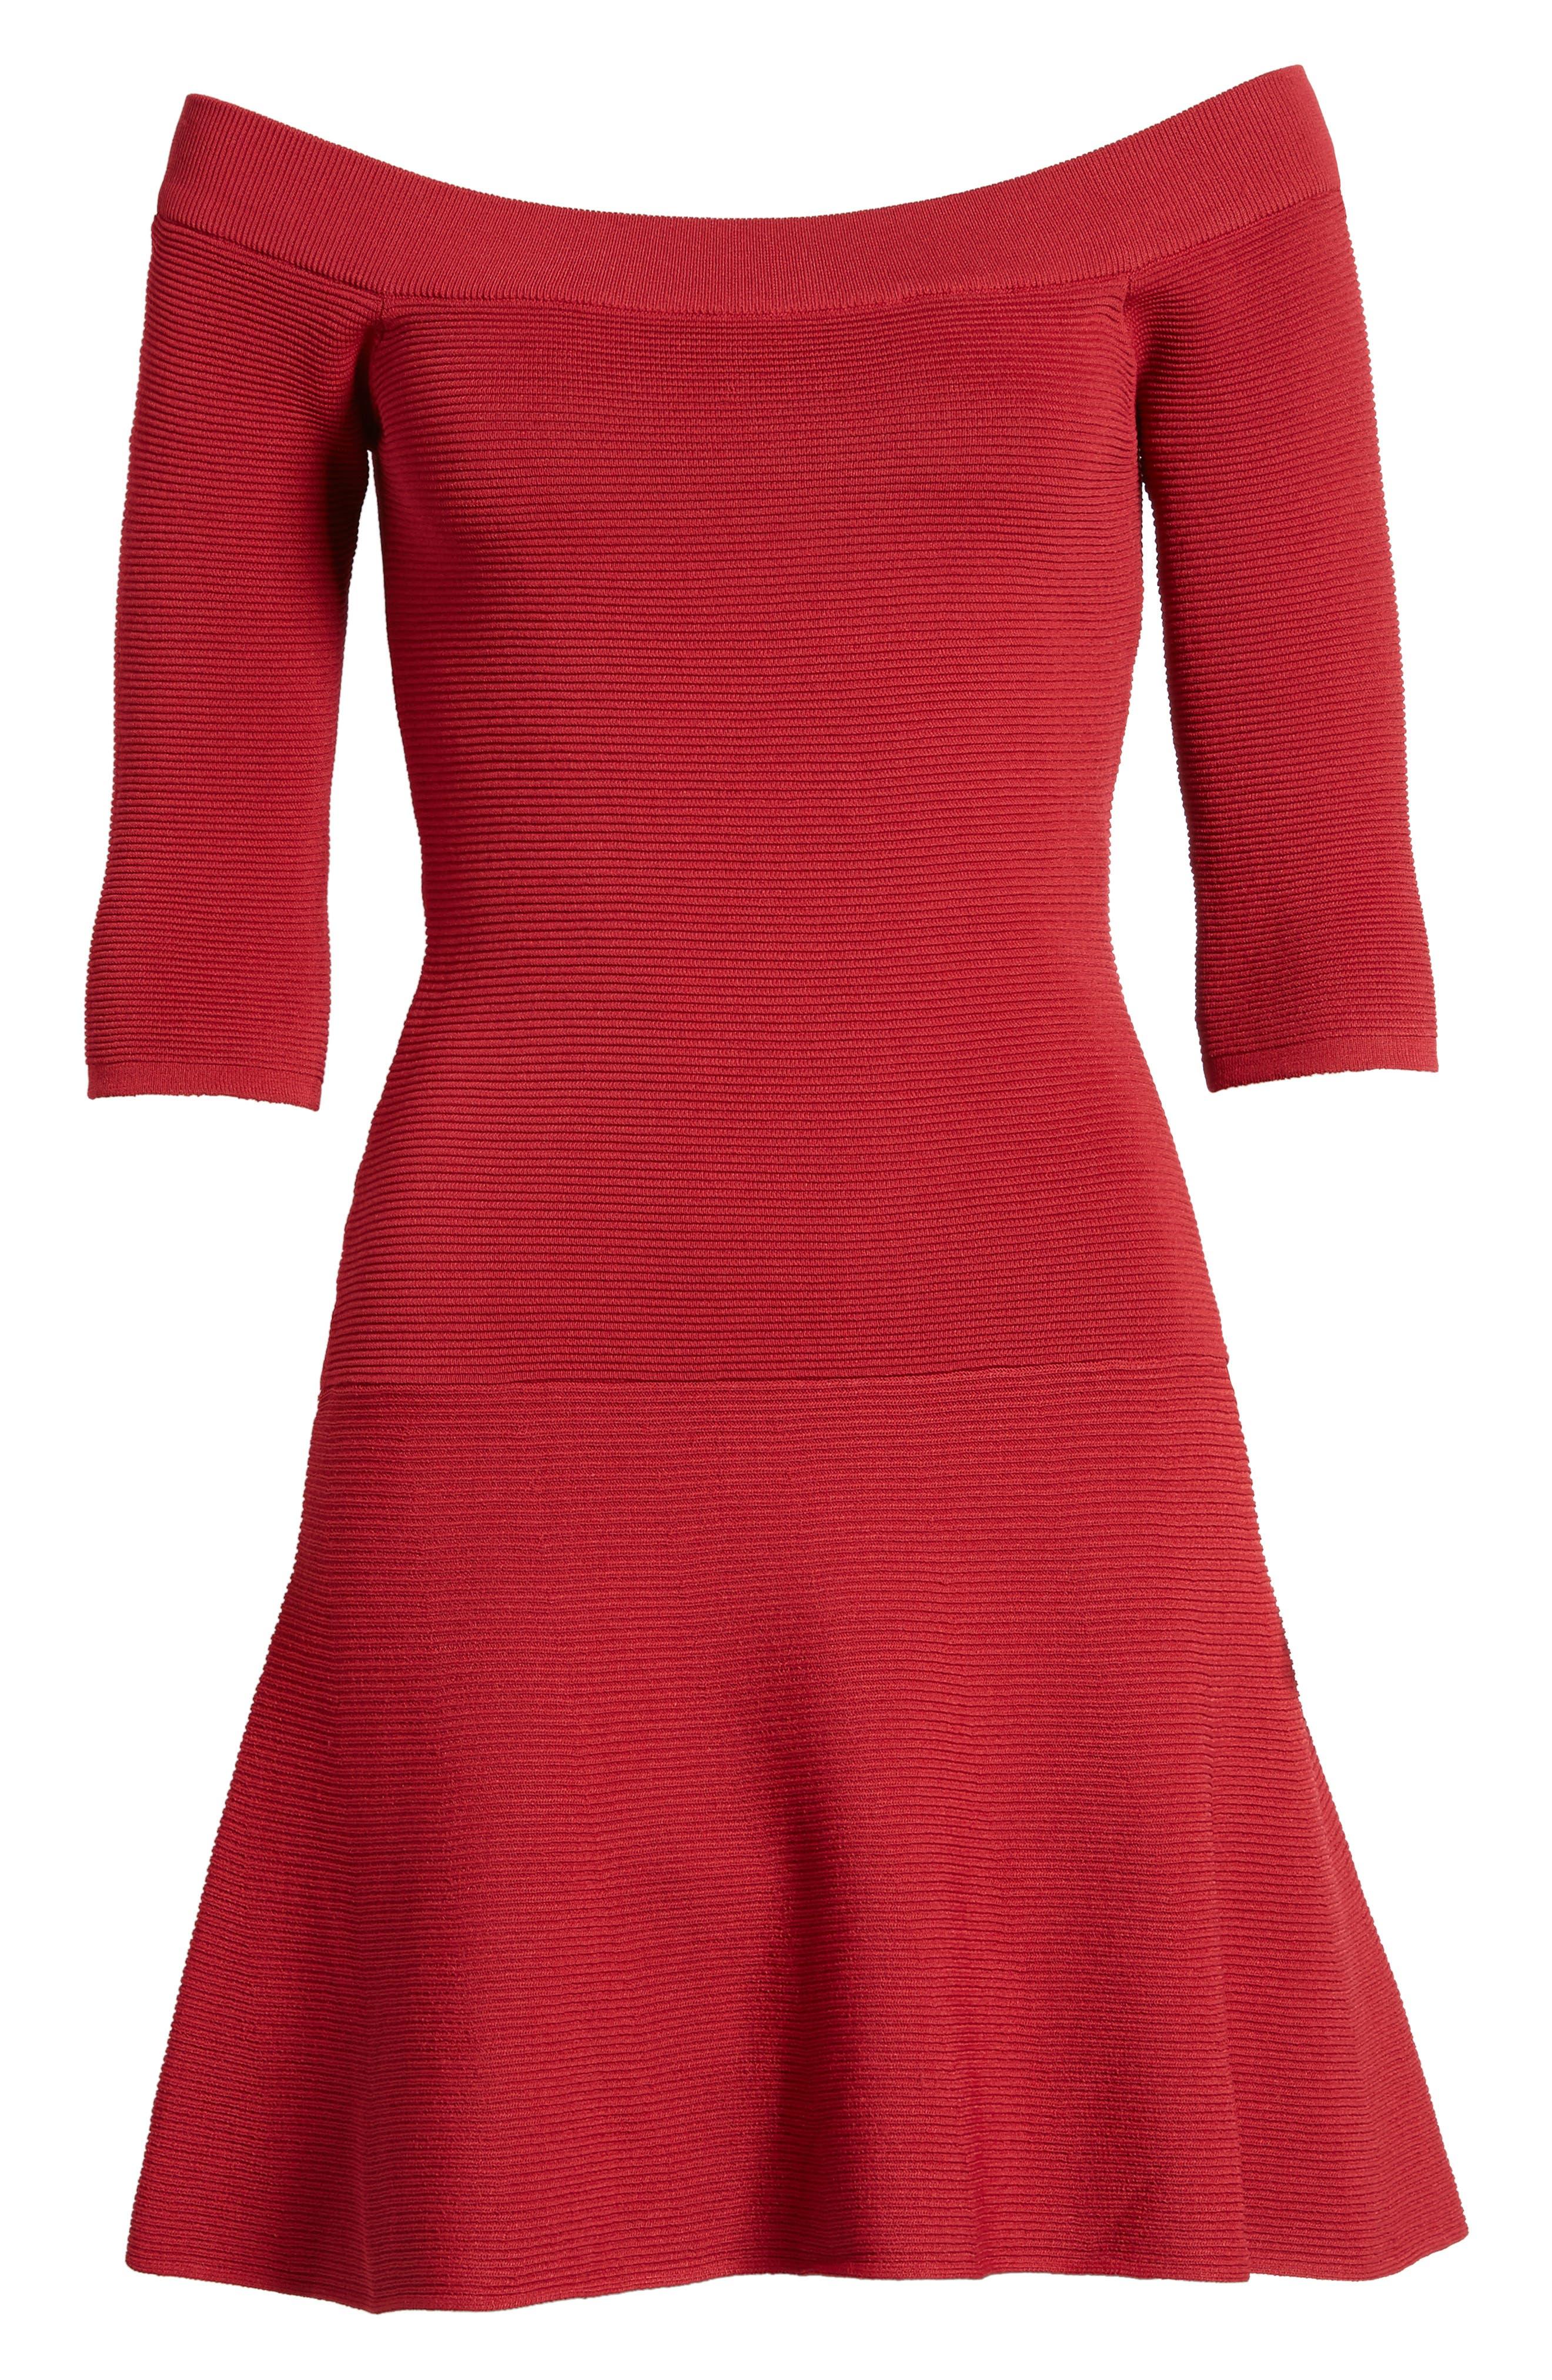 Whitley Off the Shoulder Dress,                             Alternate thumbnail 6, color,                             Crimson